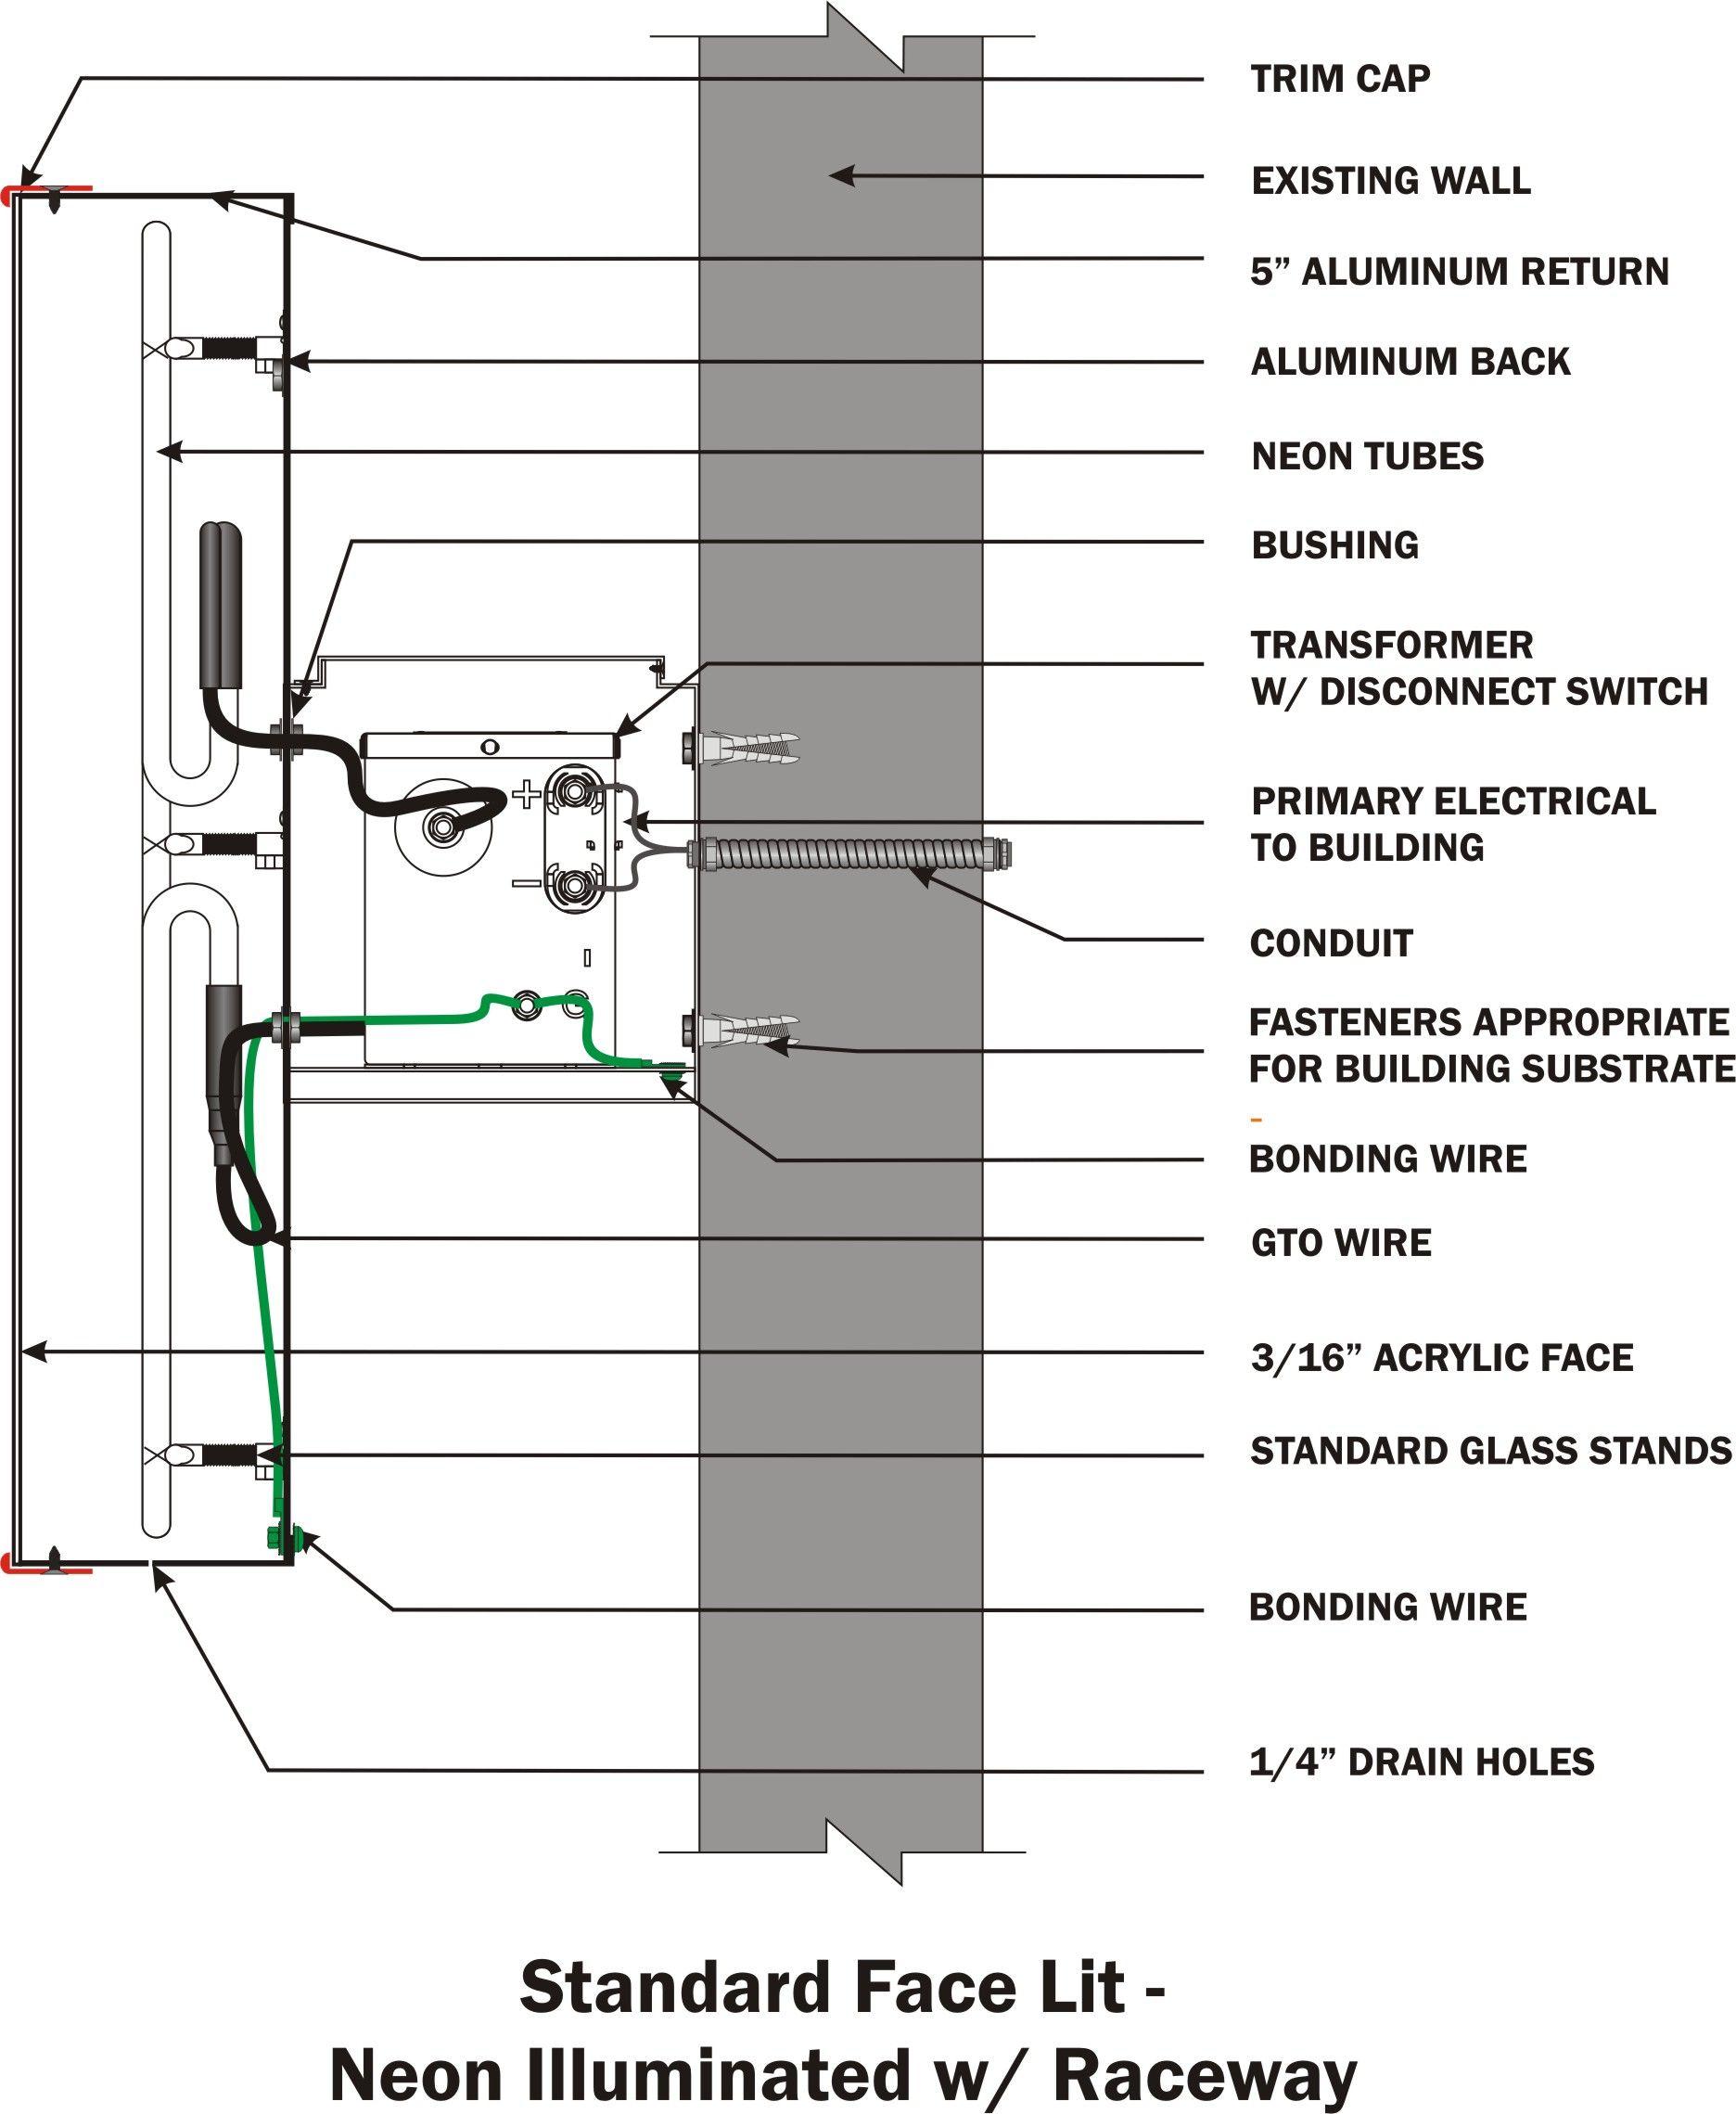 medium resolution of letter sign wiring diagrams home wiring diagram wiring diagram letters t p building signs diagram wiring diagram